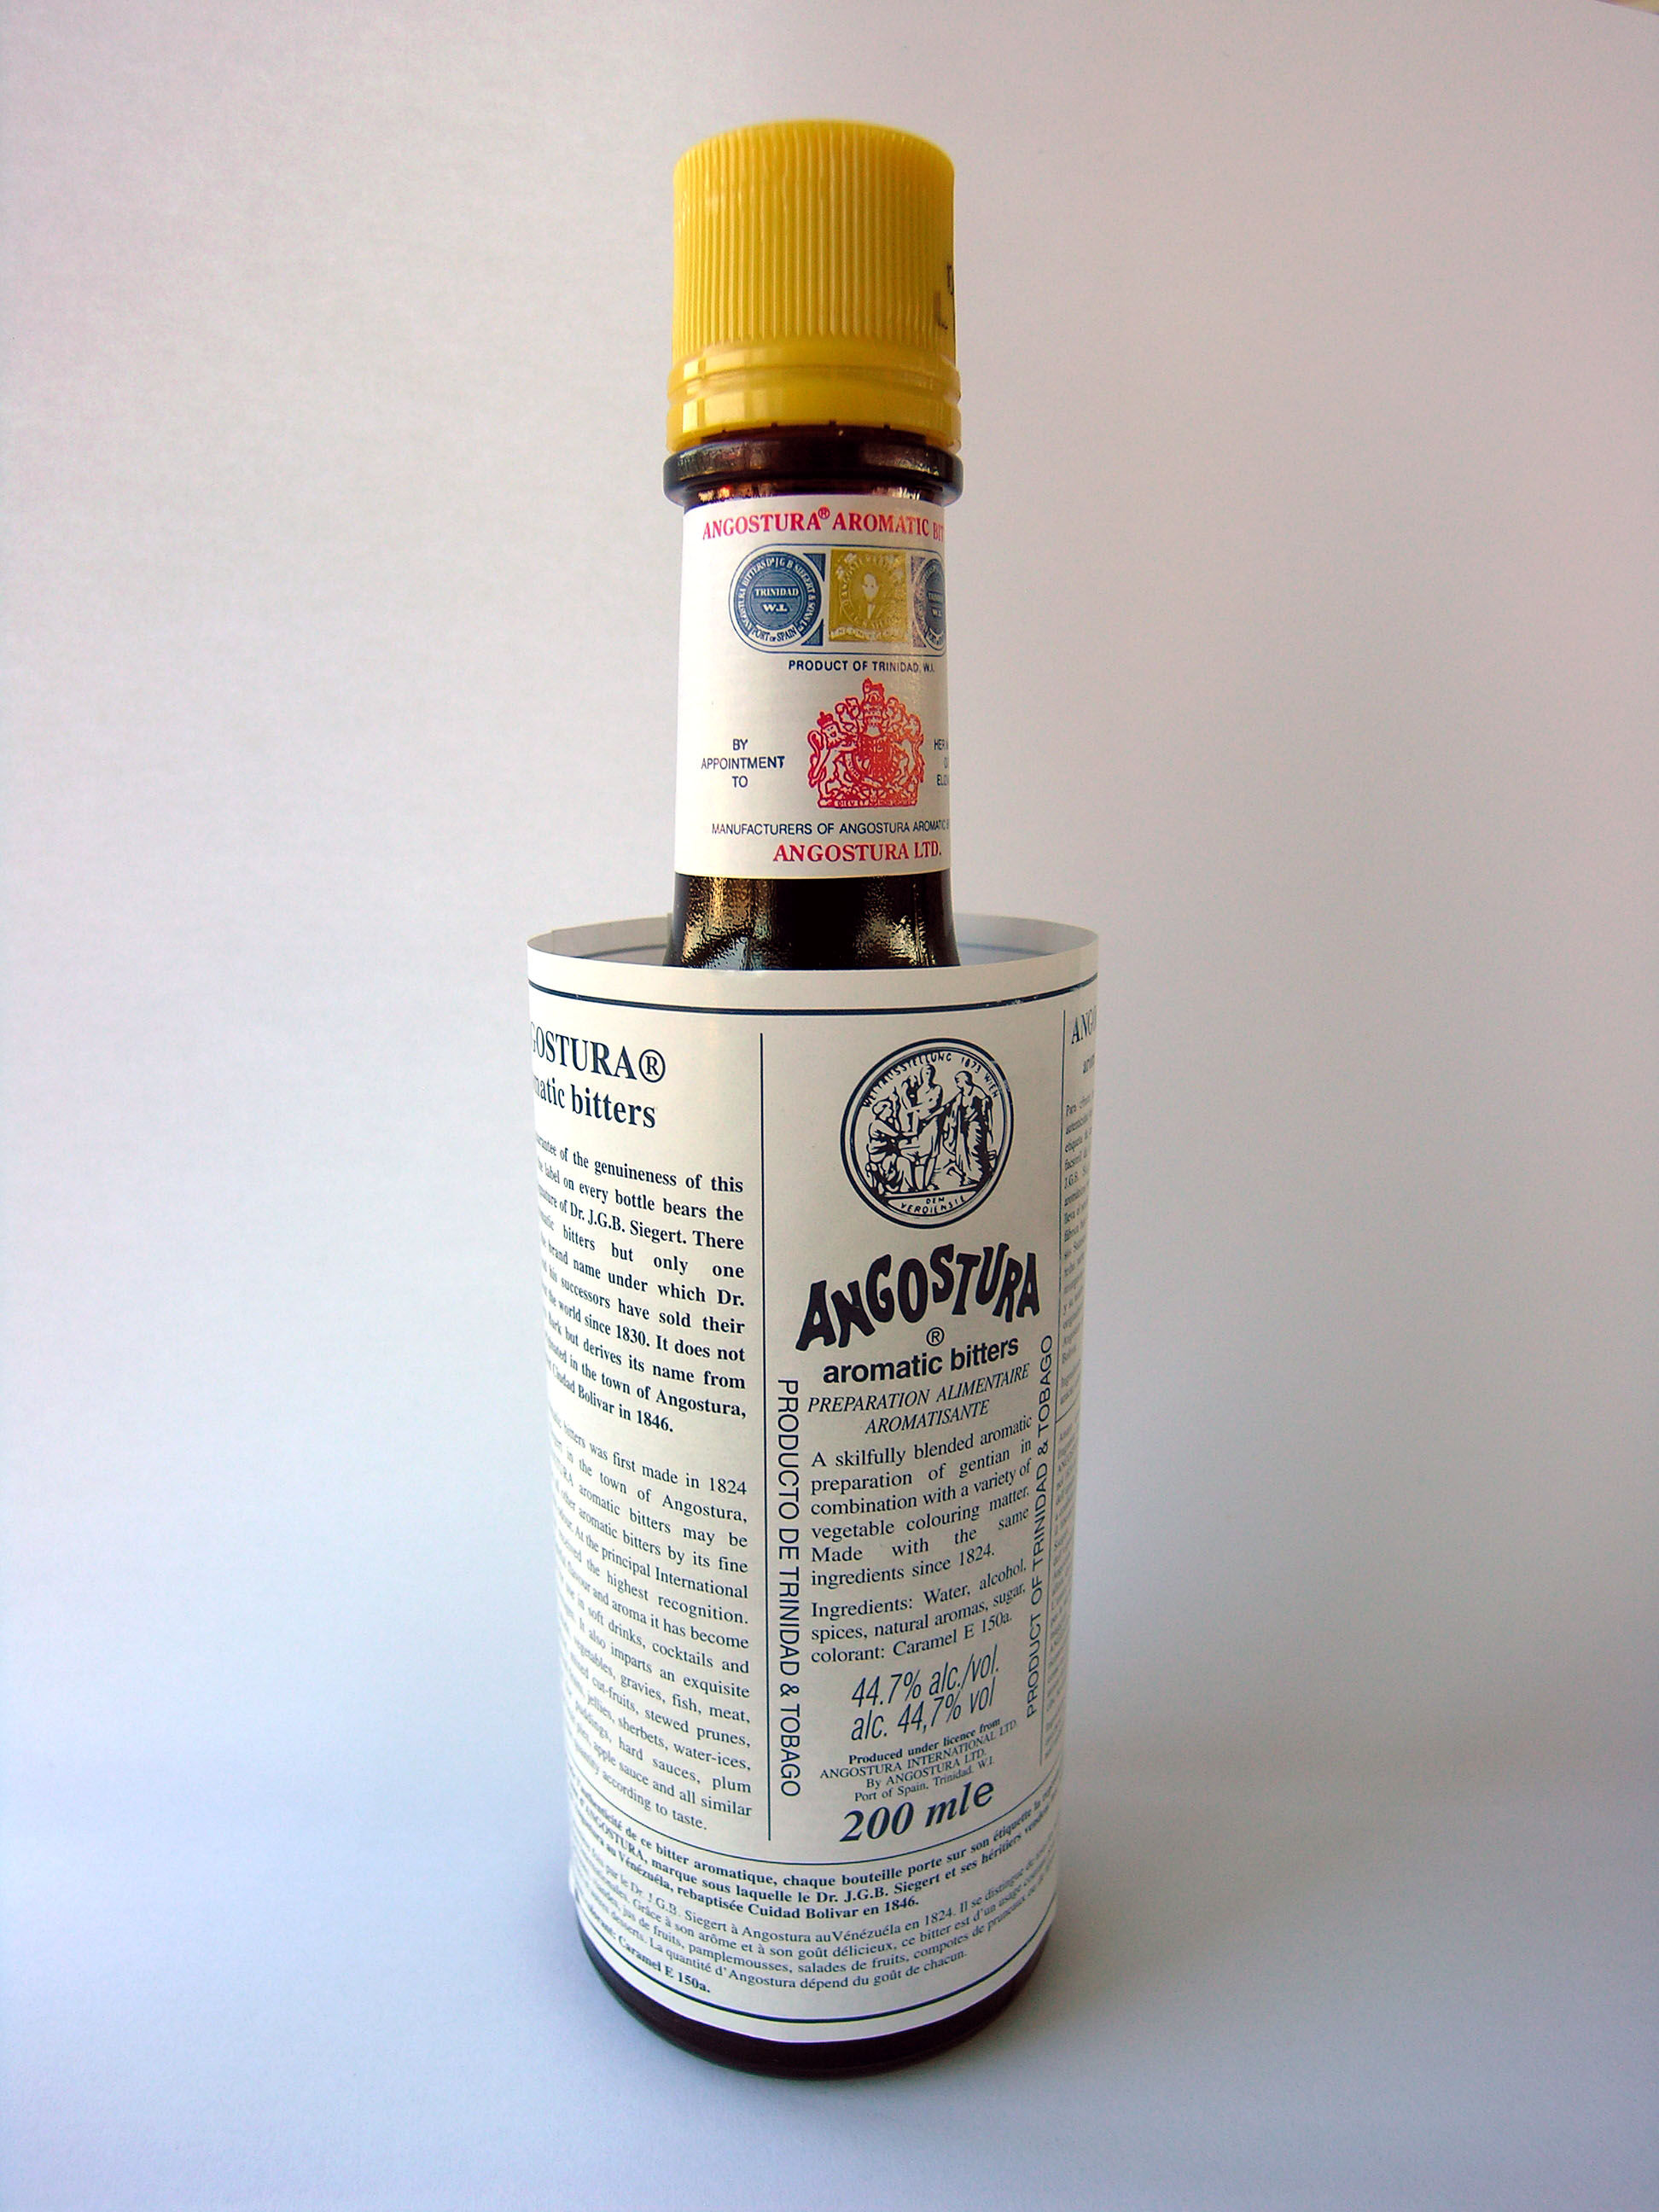 File:Angostura Bitter Flasche.jpg - Wikipedia, the free encyclopedia